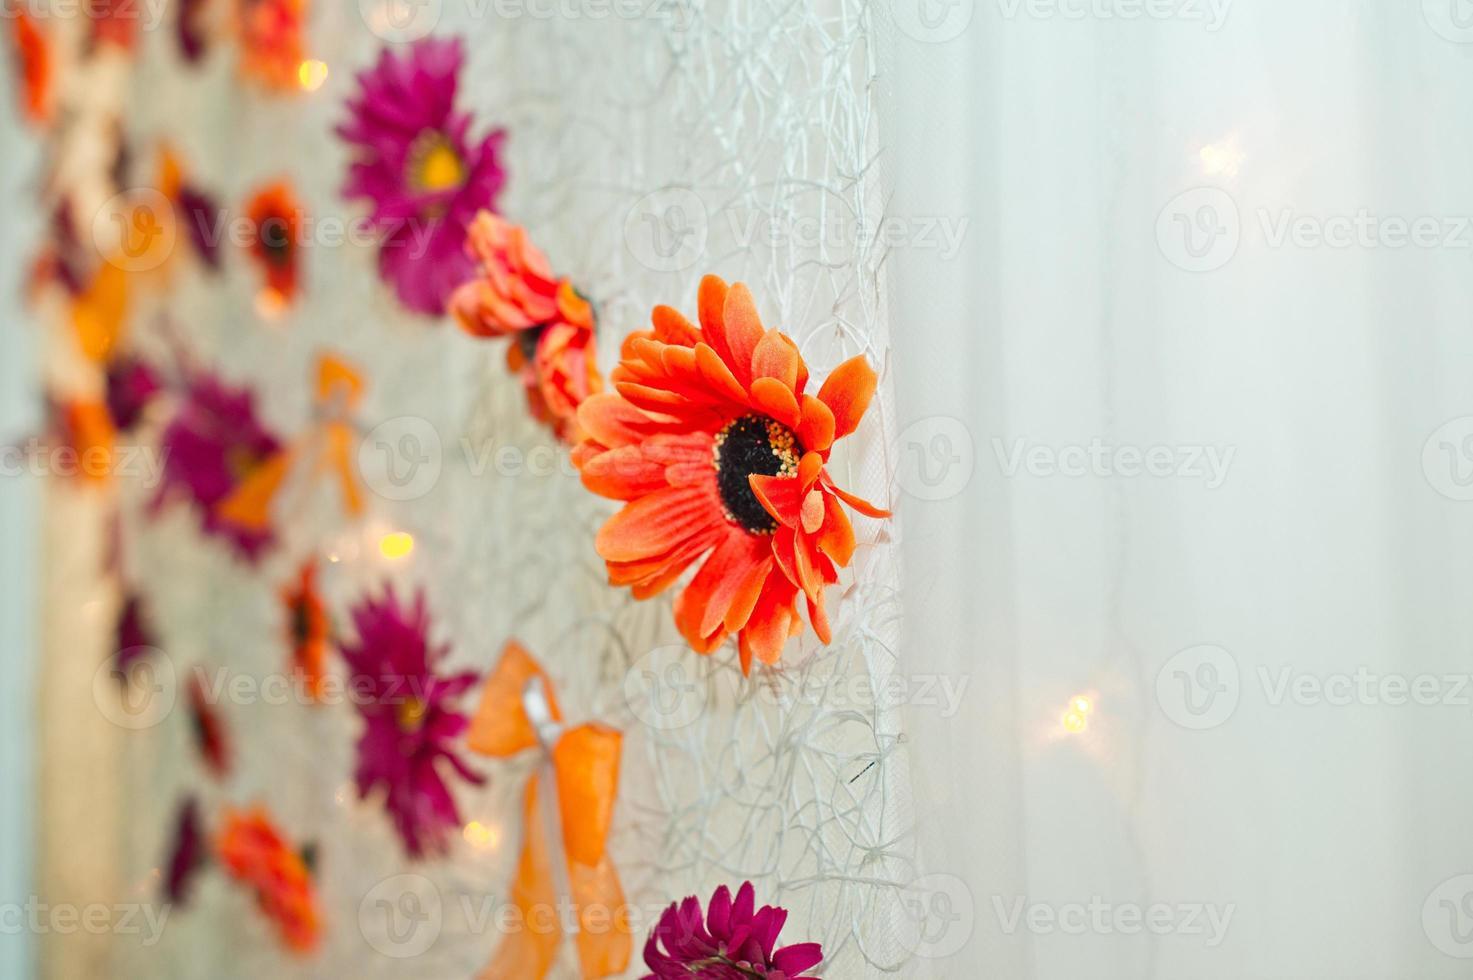 blommor på en gardin. foto